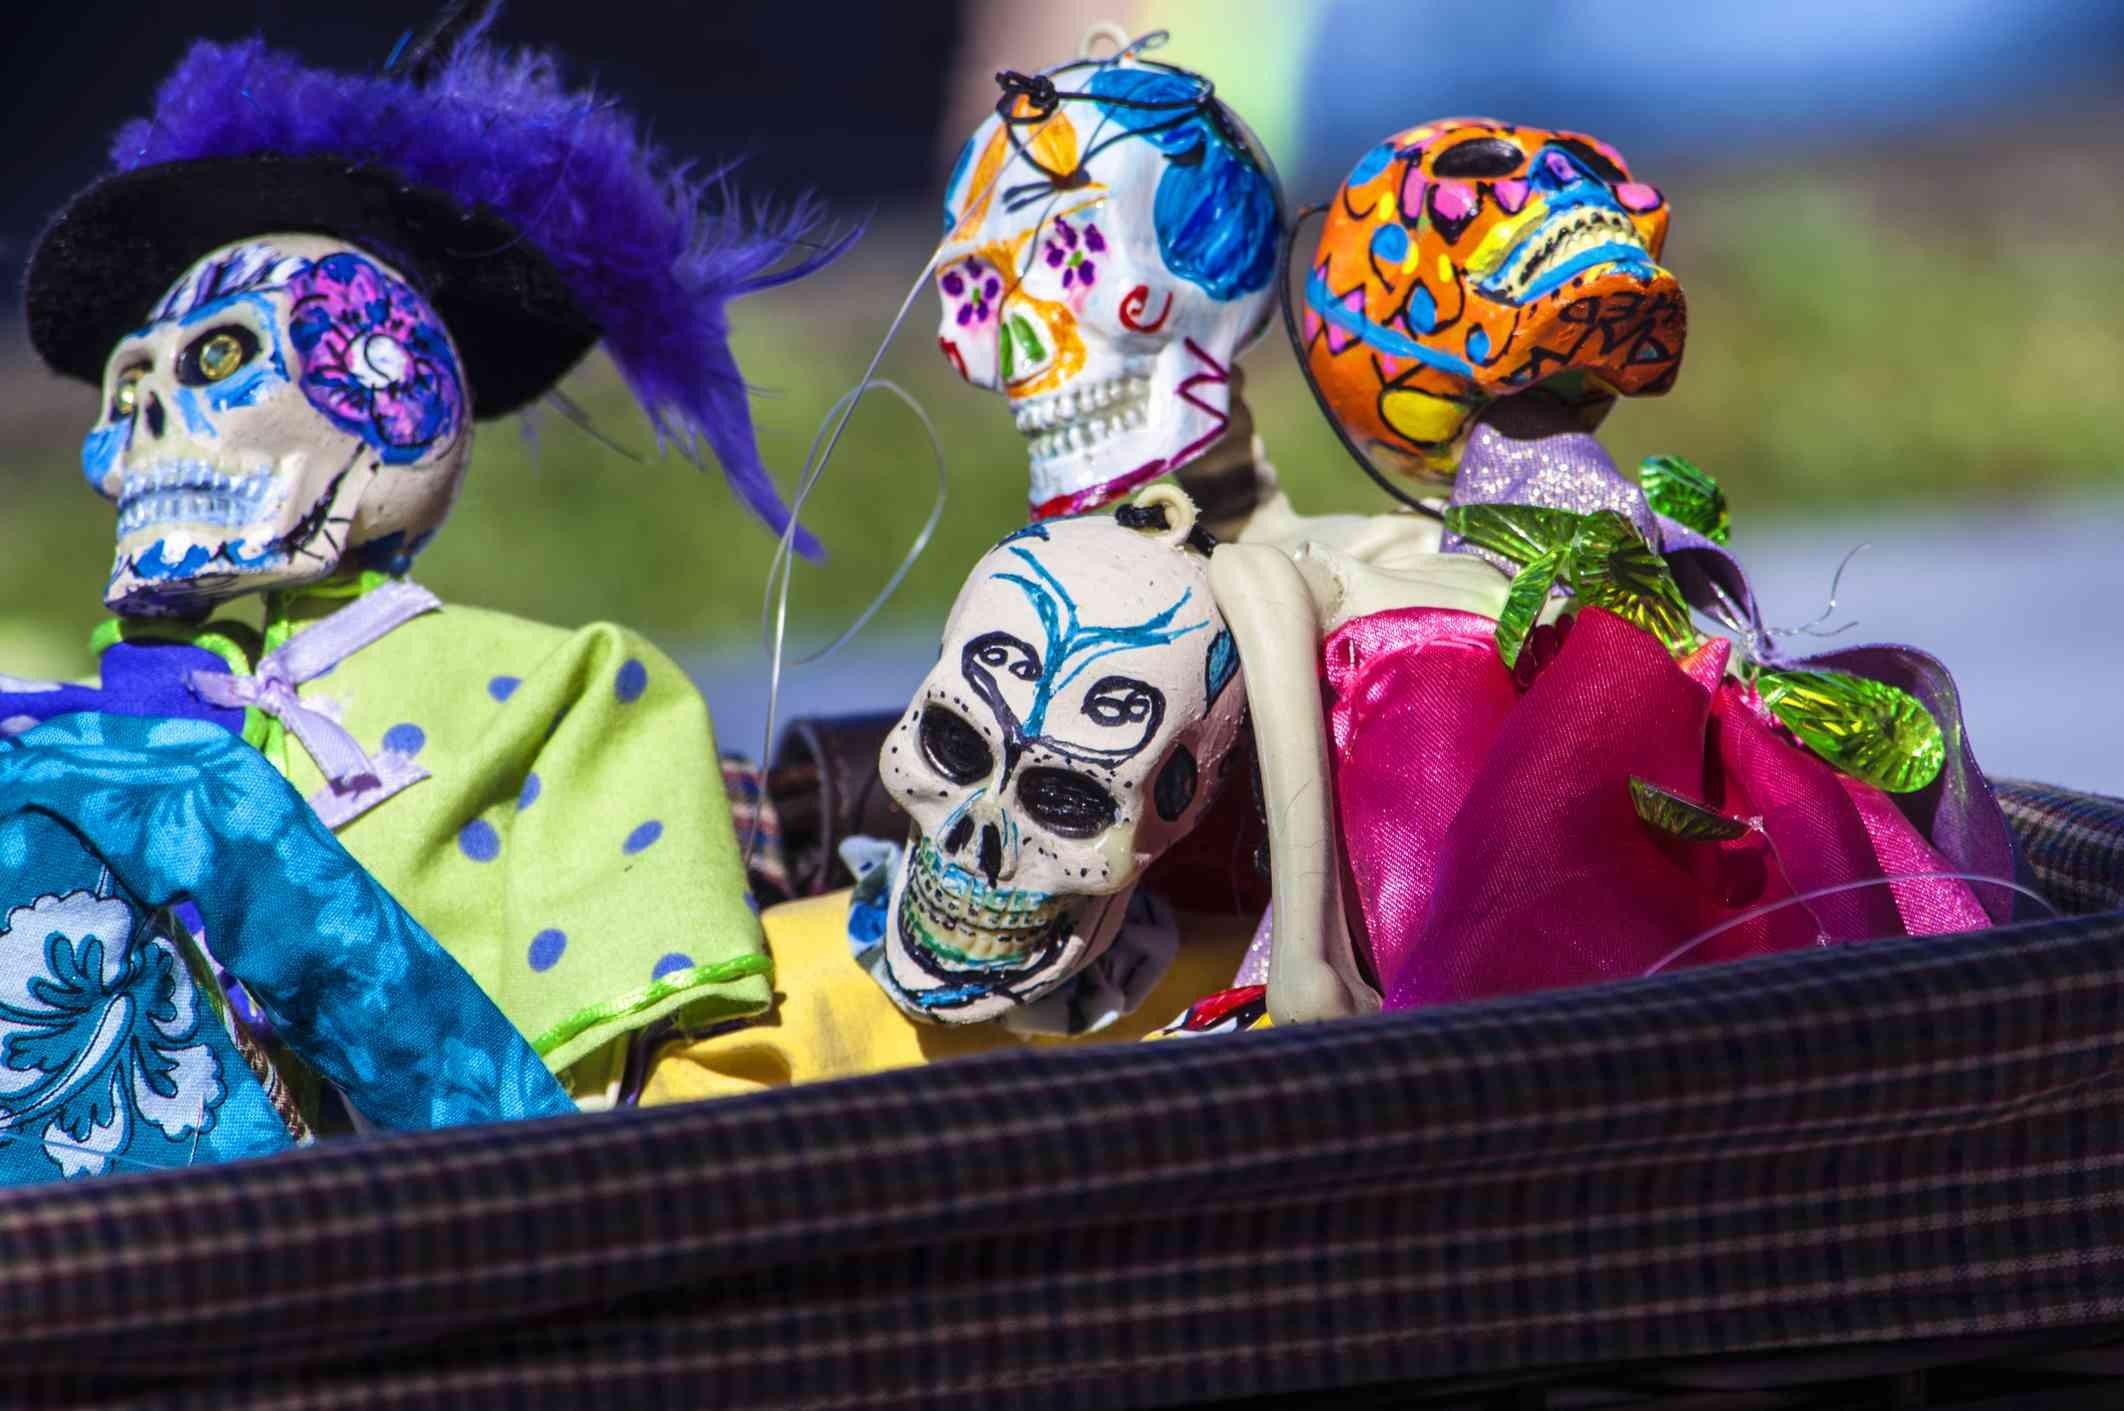 Celebrating Dia de los Muertos in the Hispanic Community